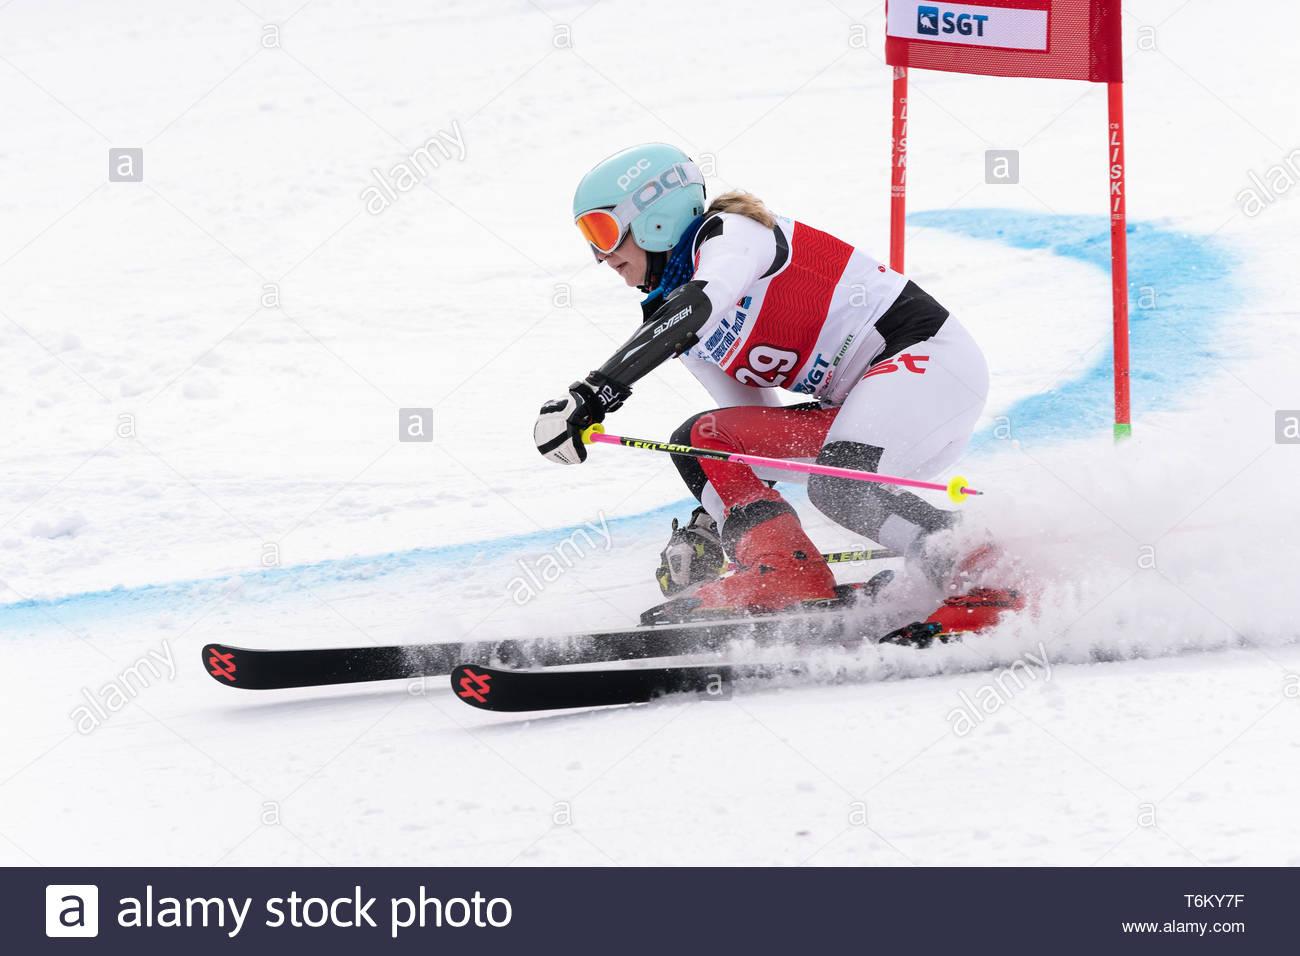 KAMCHATKA PENINSULA, RUSSIA - APRIL 2, 2019: Mountain skier Elizaveta Elesina (Sverdlovsk) skiing down mount. International Ski Federation, Championsh - Stock Image